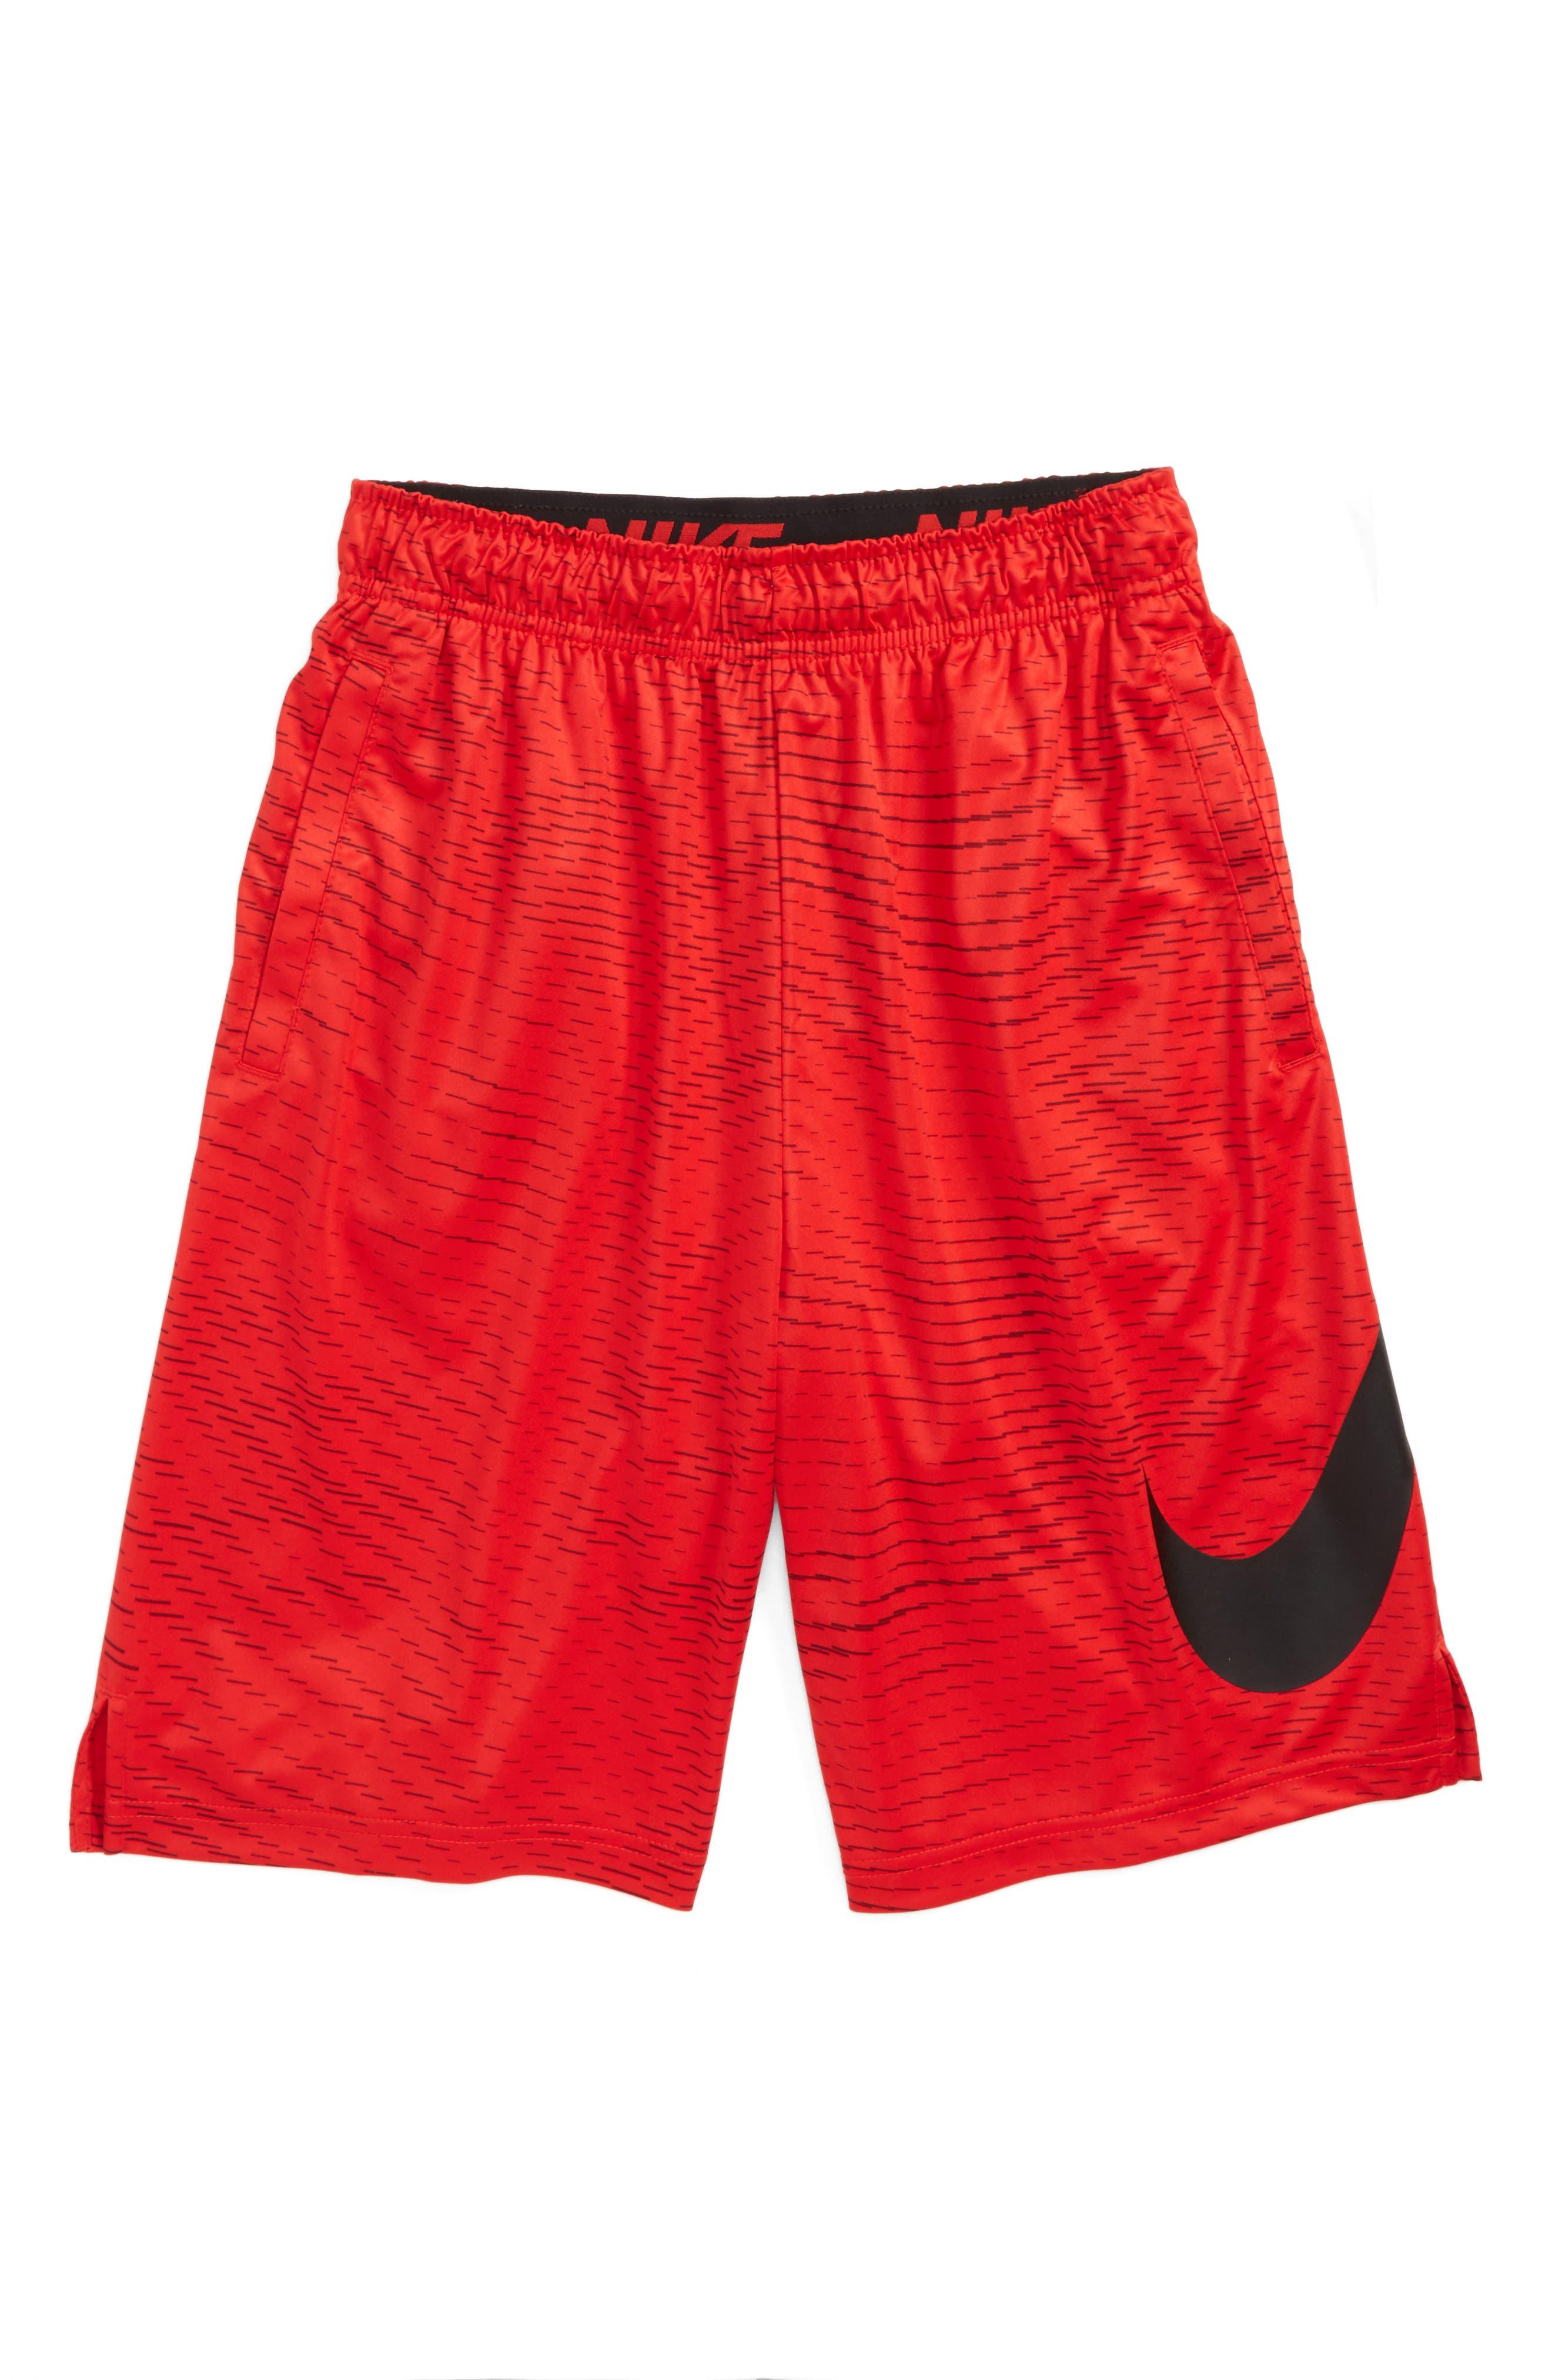 Alternate Image 1 Selected - Nike AOP Dry Shorts (Little Boys & Big Boys)